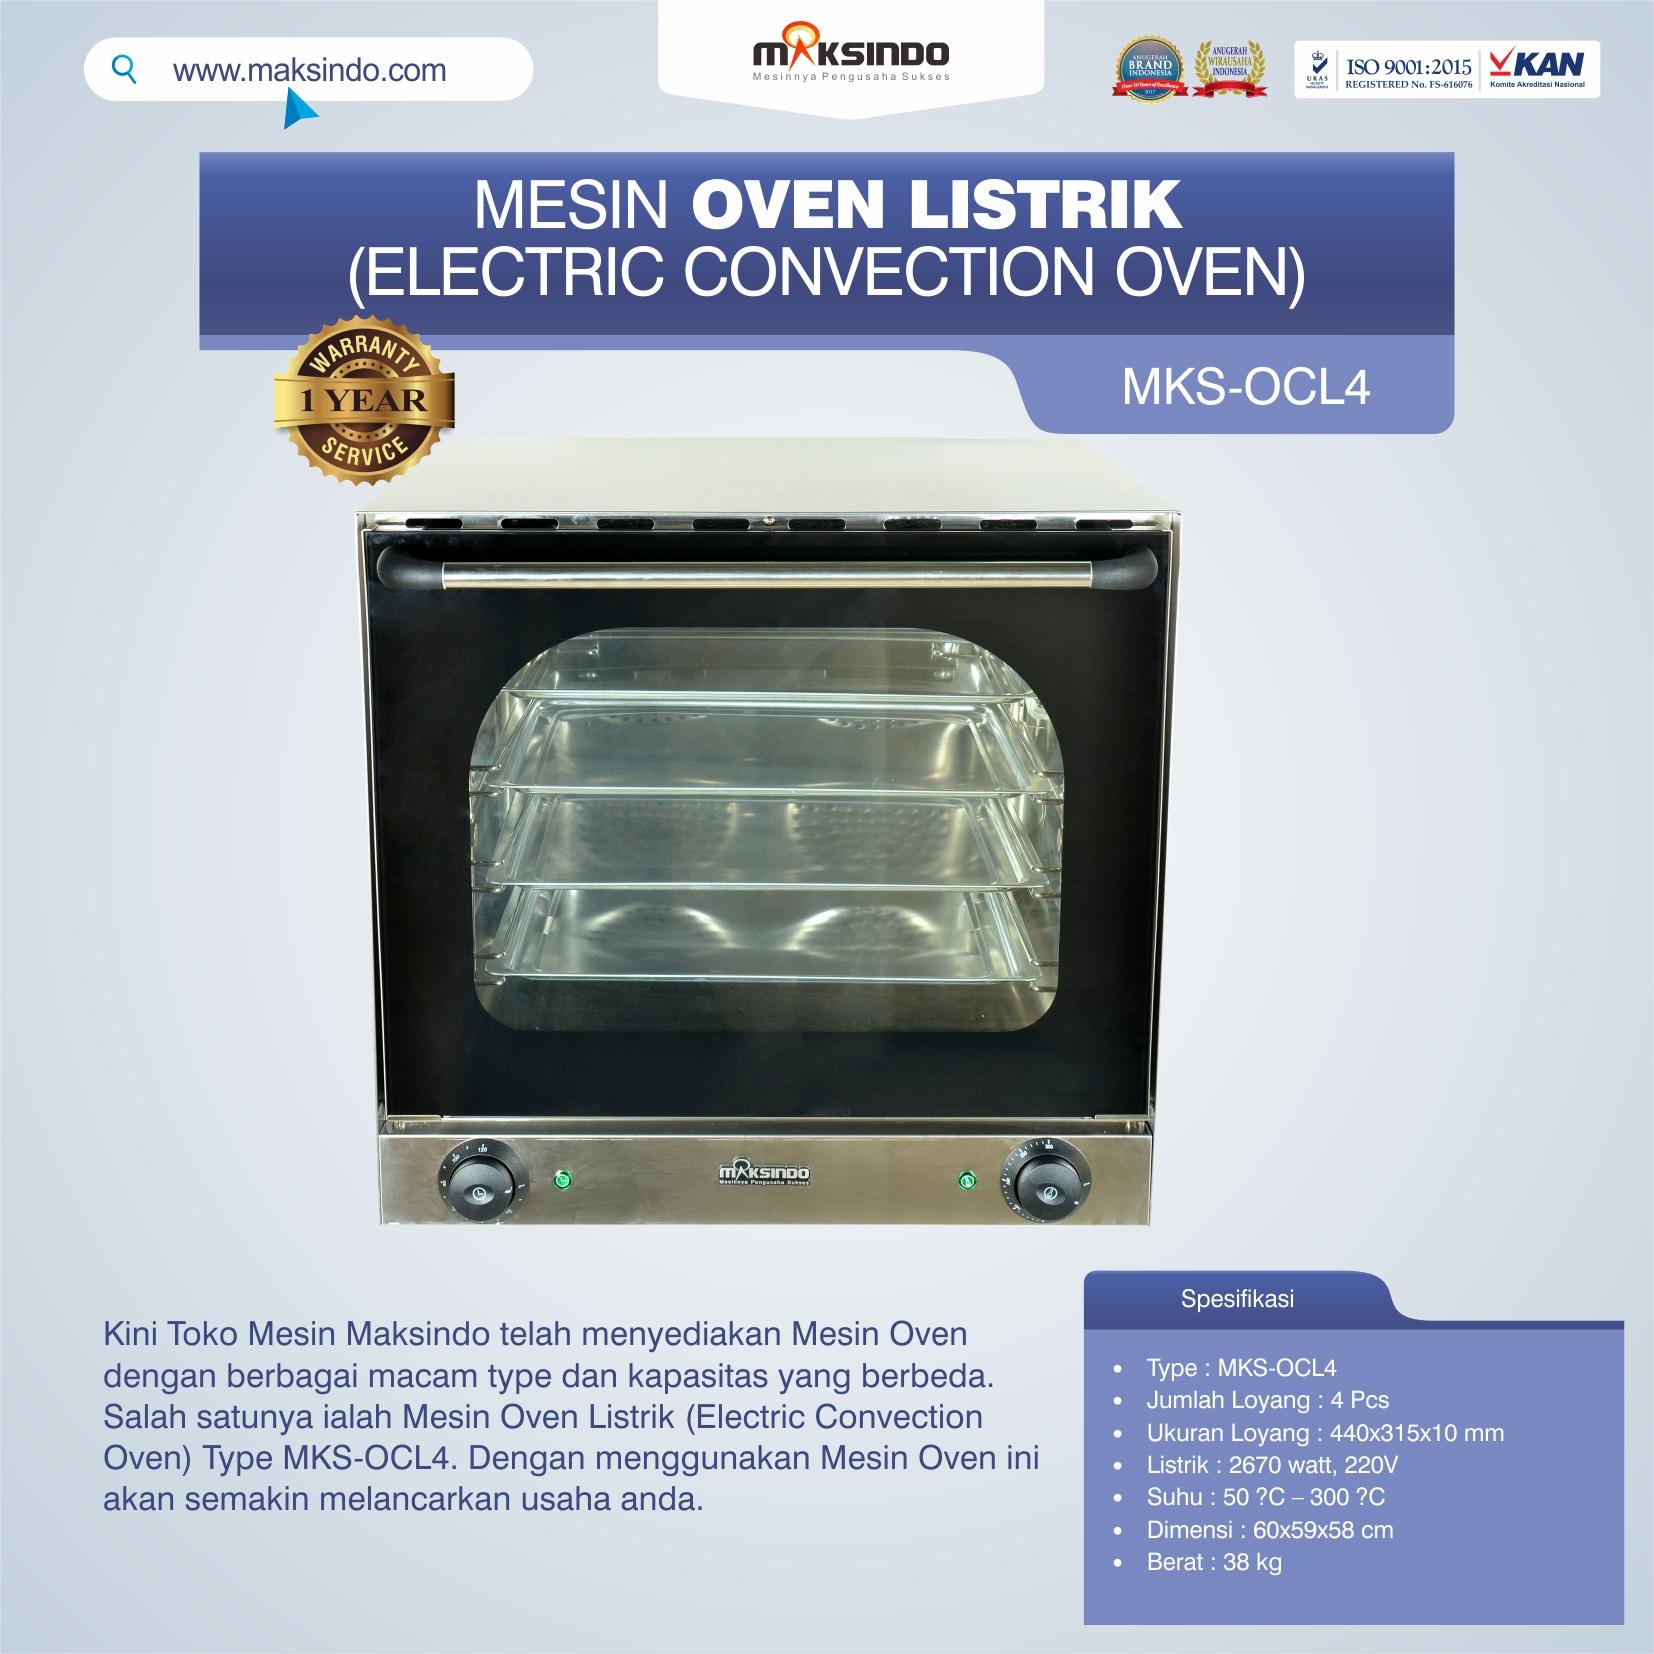 Jual Mesin Oven Listrik (Electric Convection Oven) MKS-OCL4 di Yogyakarta